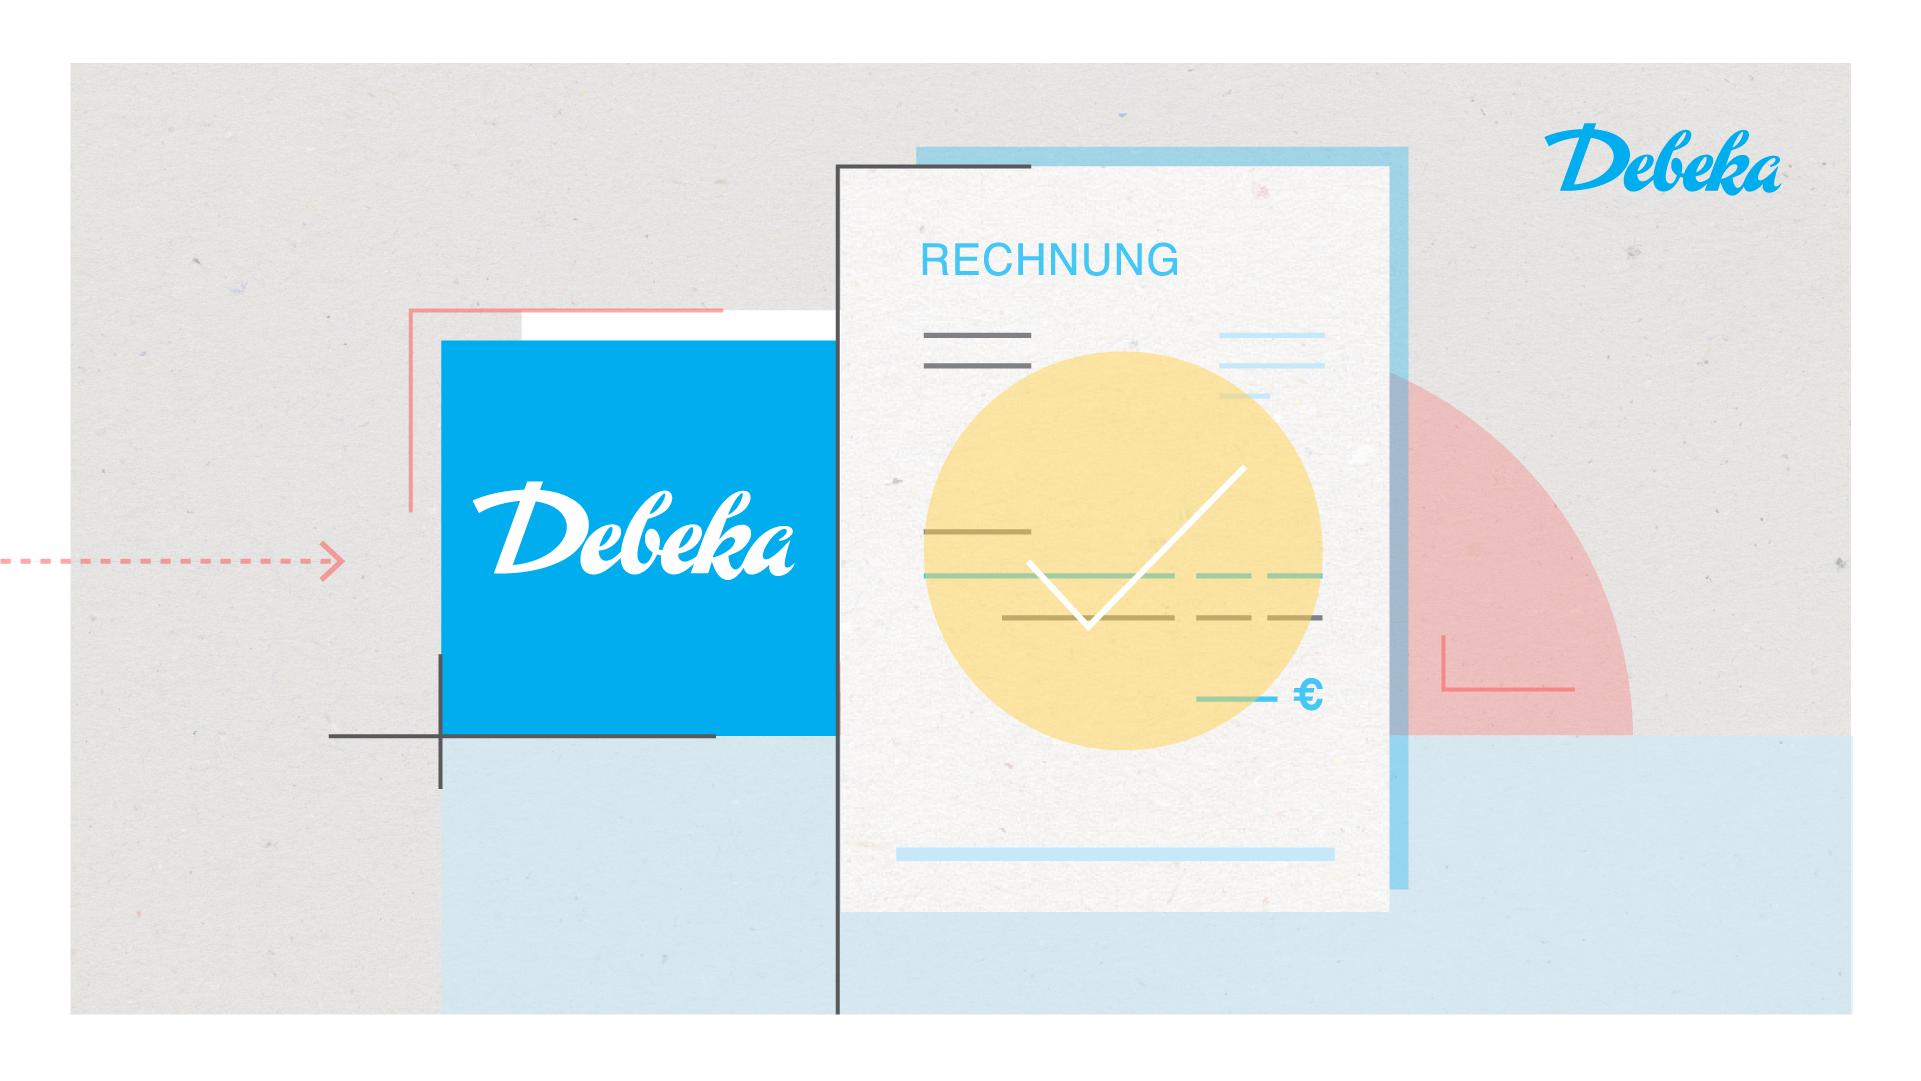 160518_Debeka-App-11.png